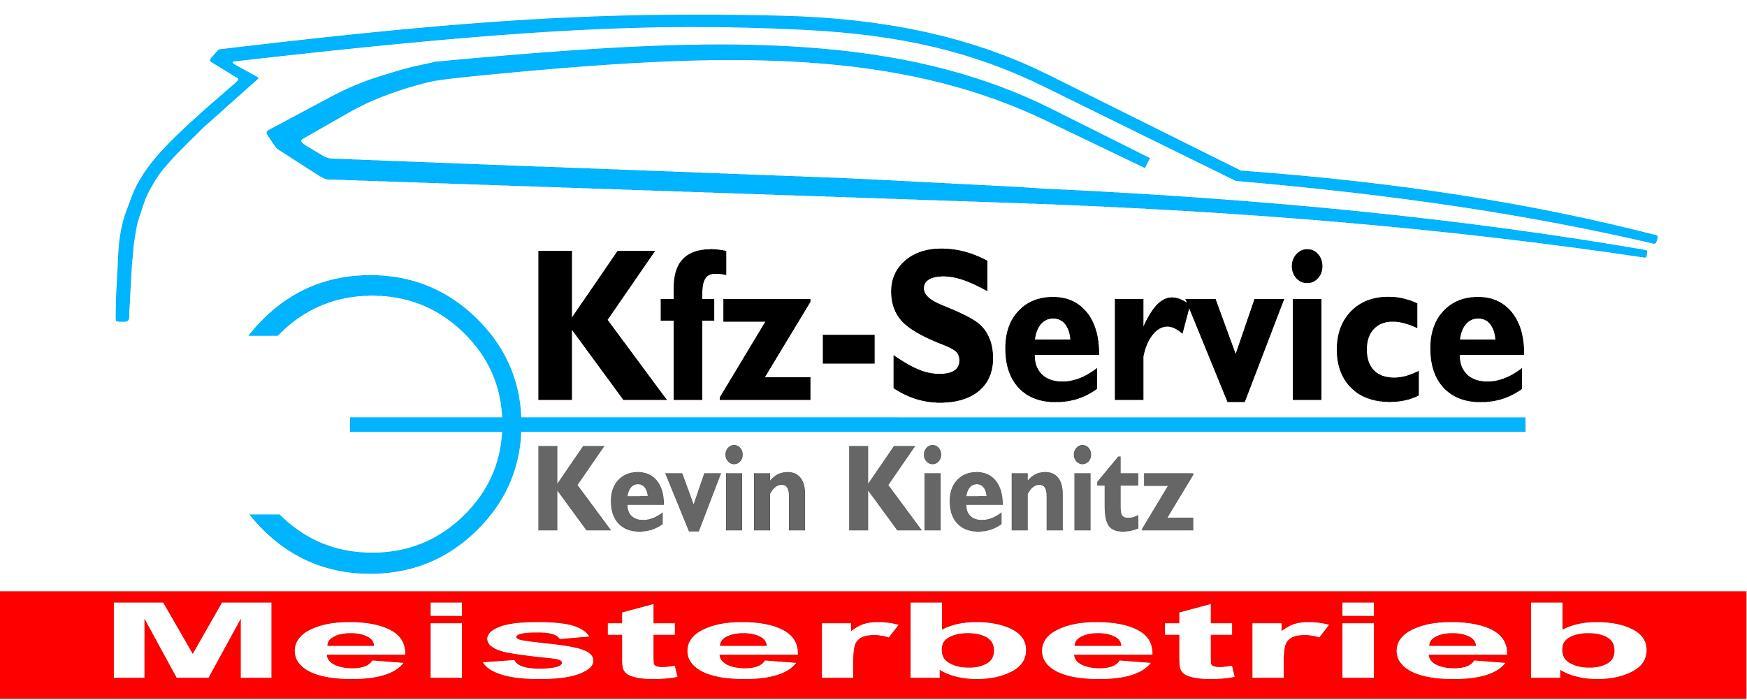 Bild zu Kevin Kienitz - Kfz Meisterbetrieb in Waiblingen